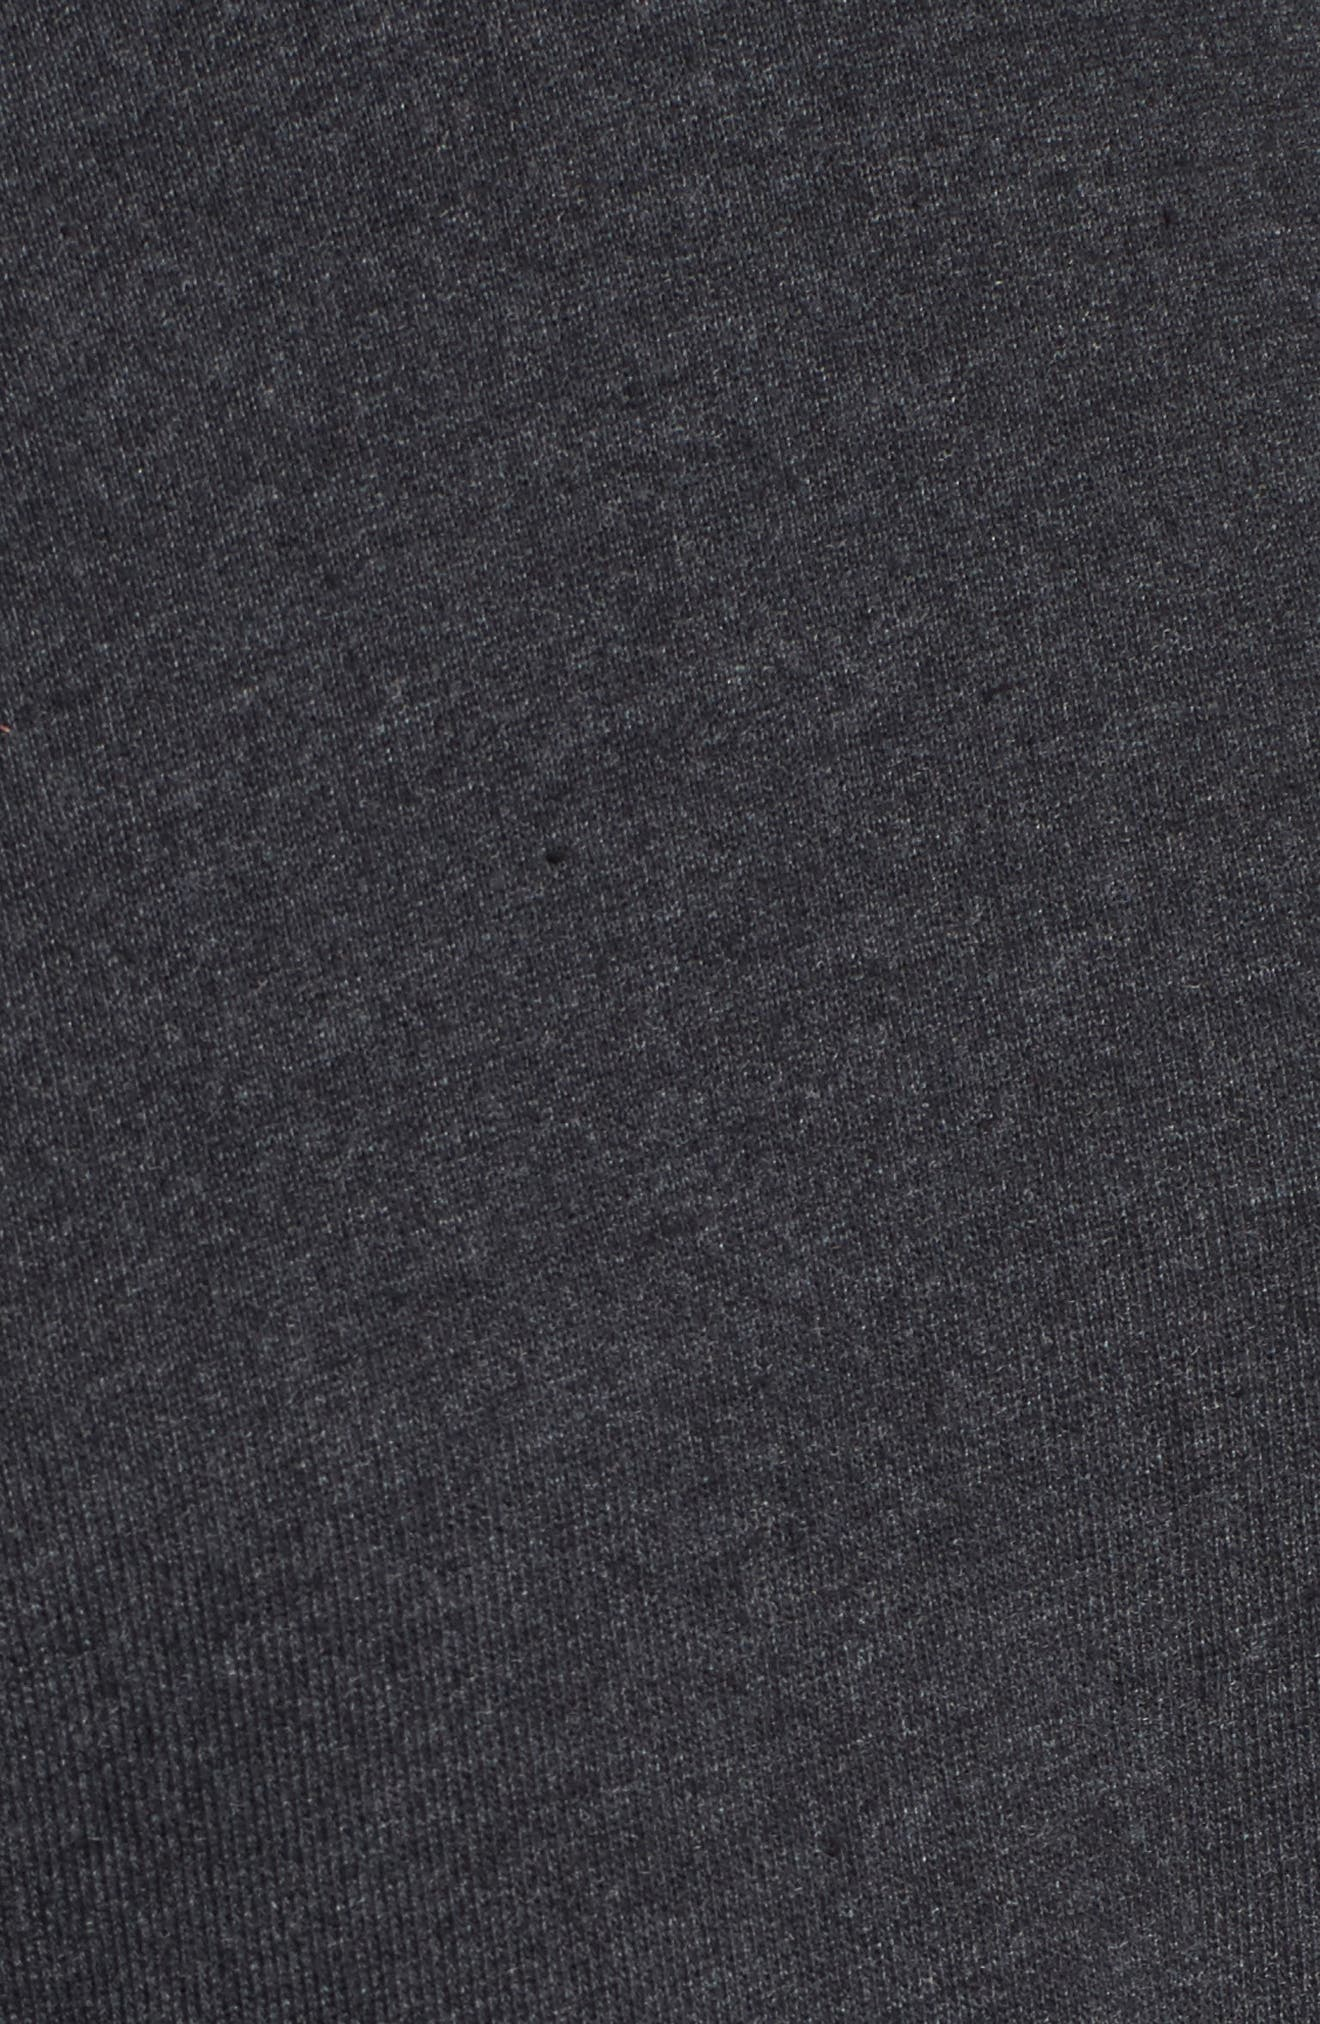 Viera Fleece Peplum Sweatshirt,                             Alternate thumbnail 9, color,